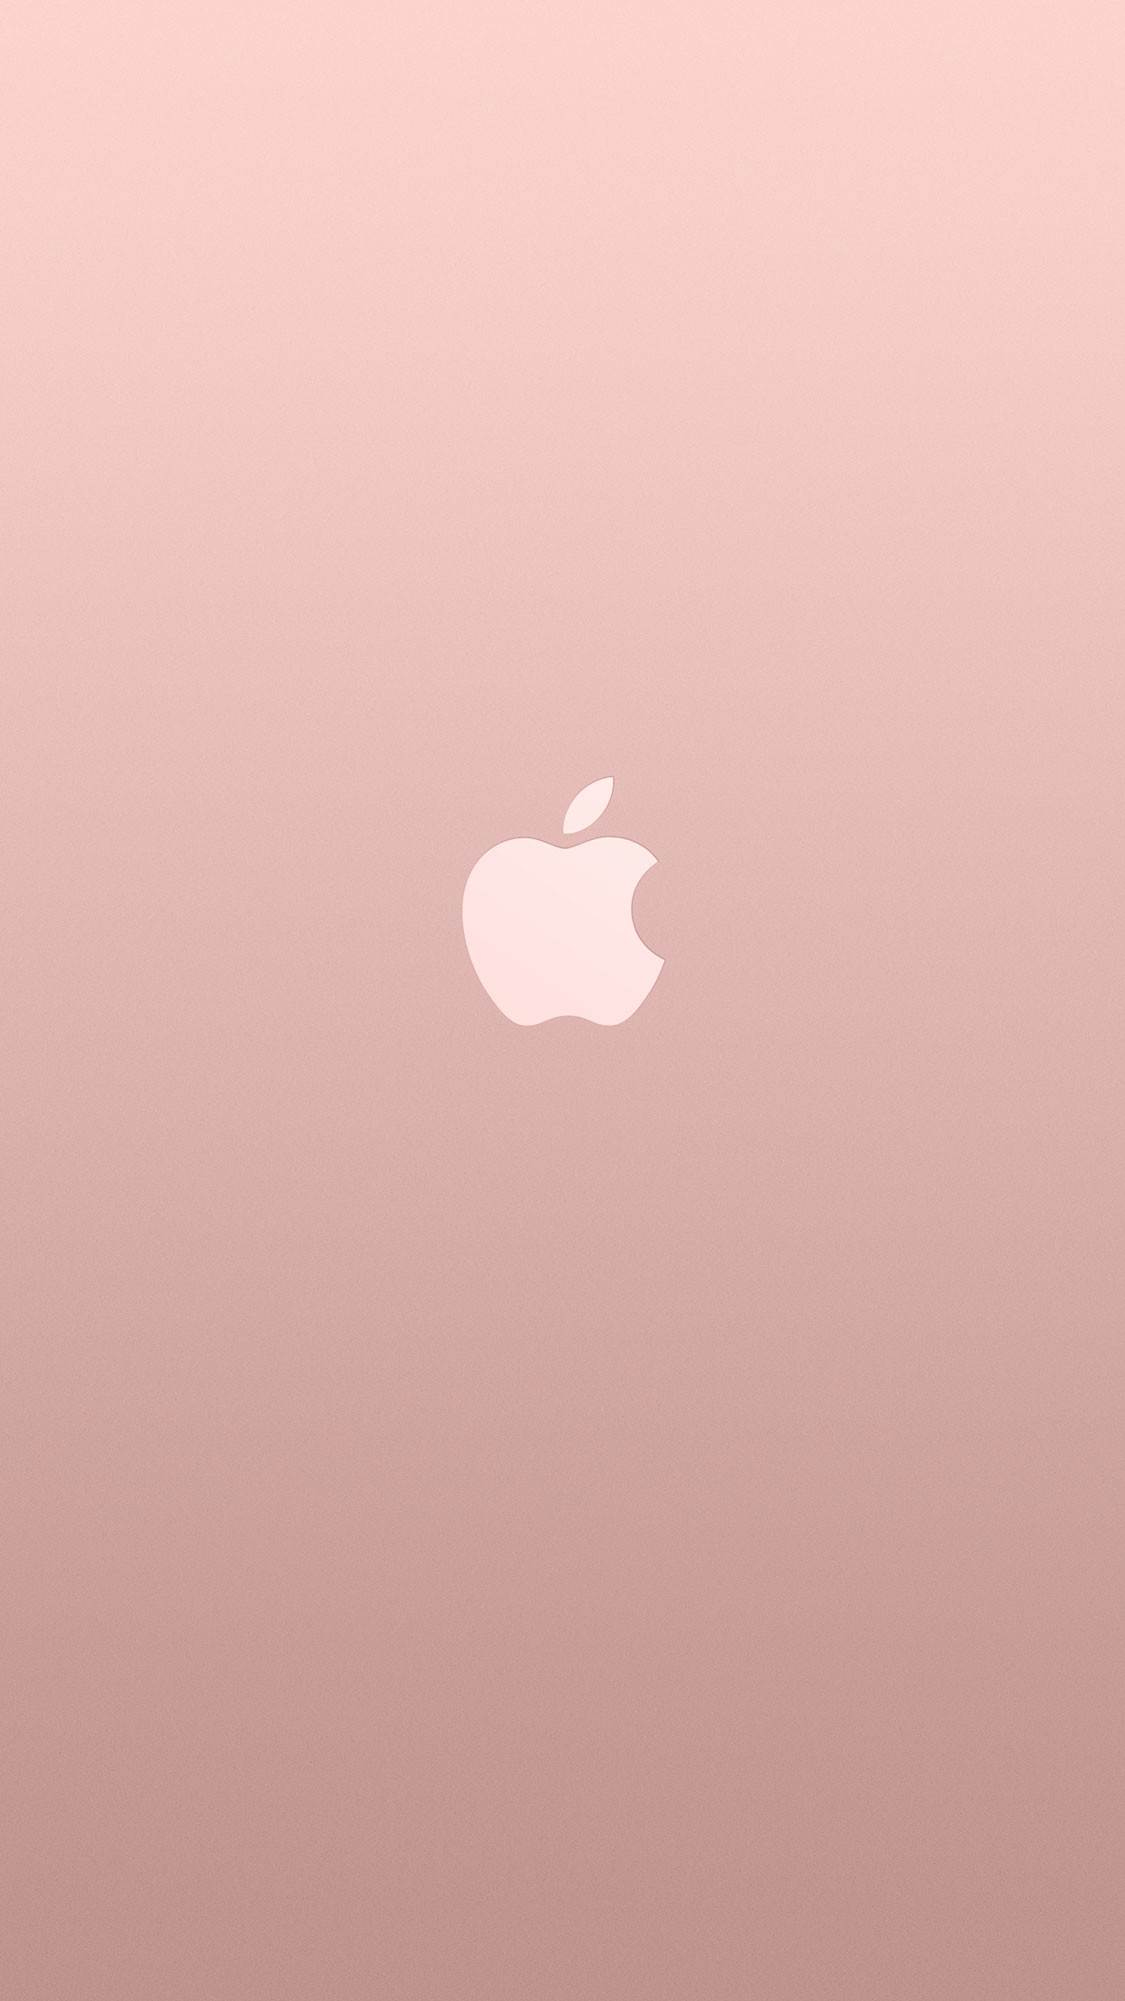 Rose-Gold-Apple-iPhone-6s-wallpaper-HD.jpg (